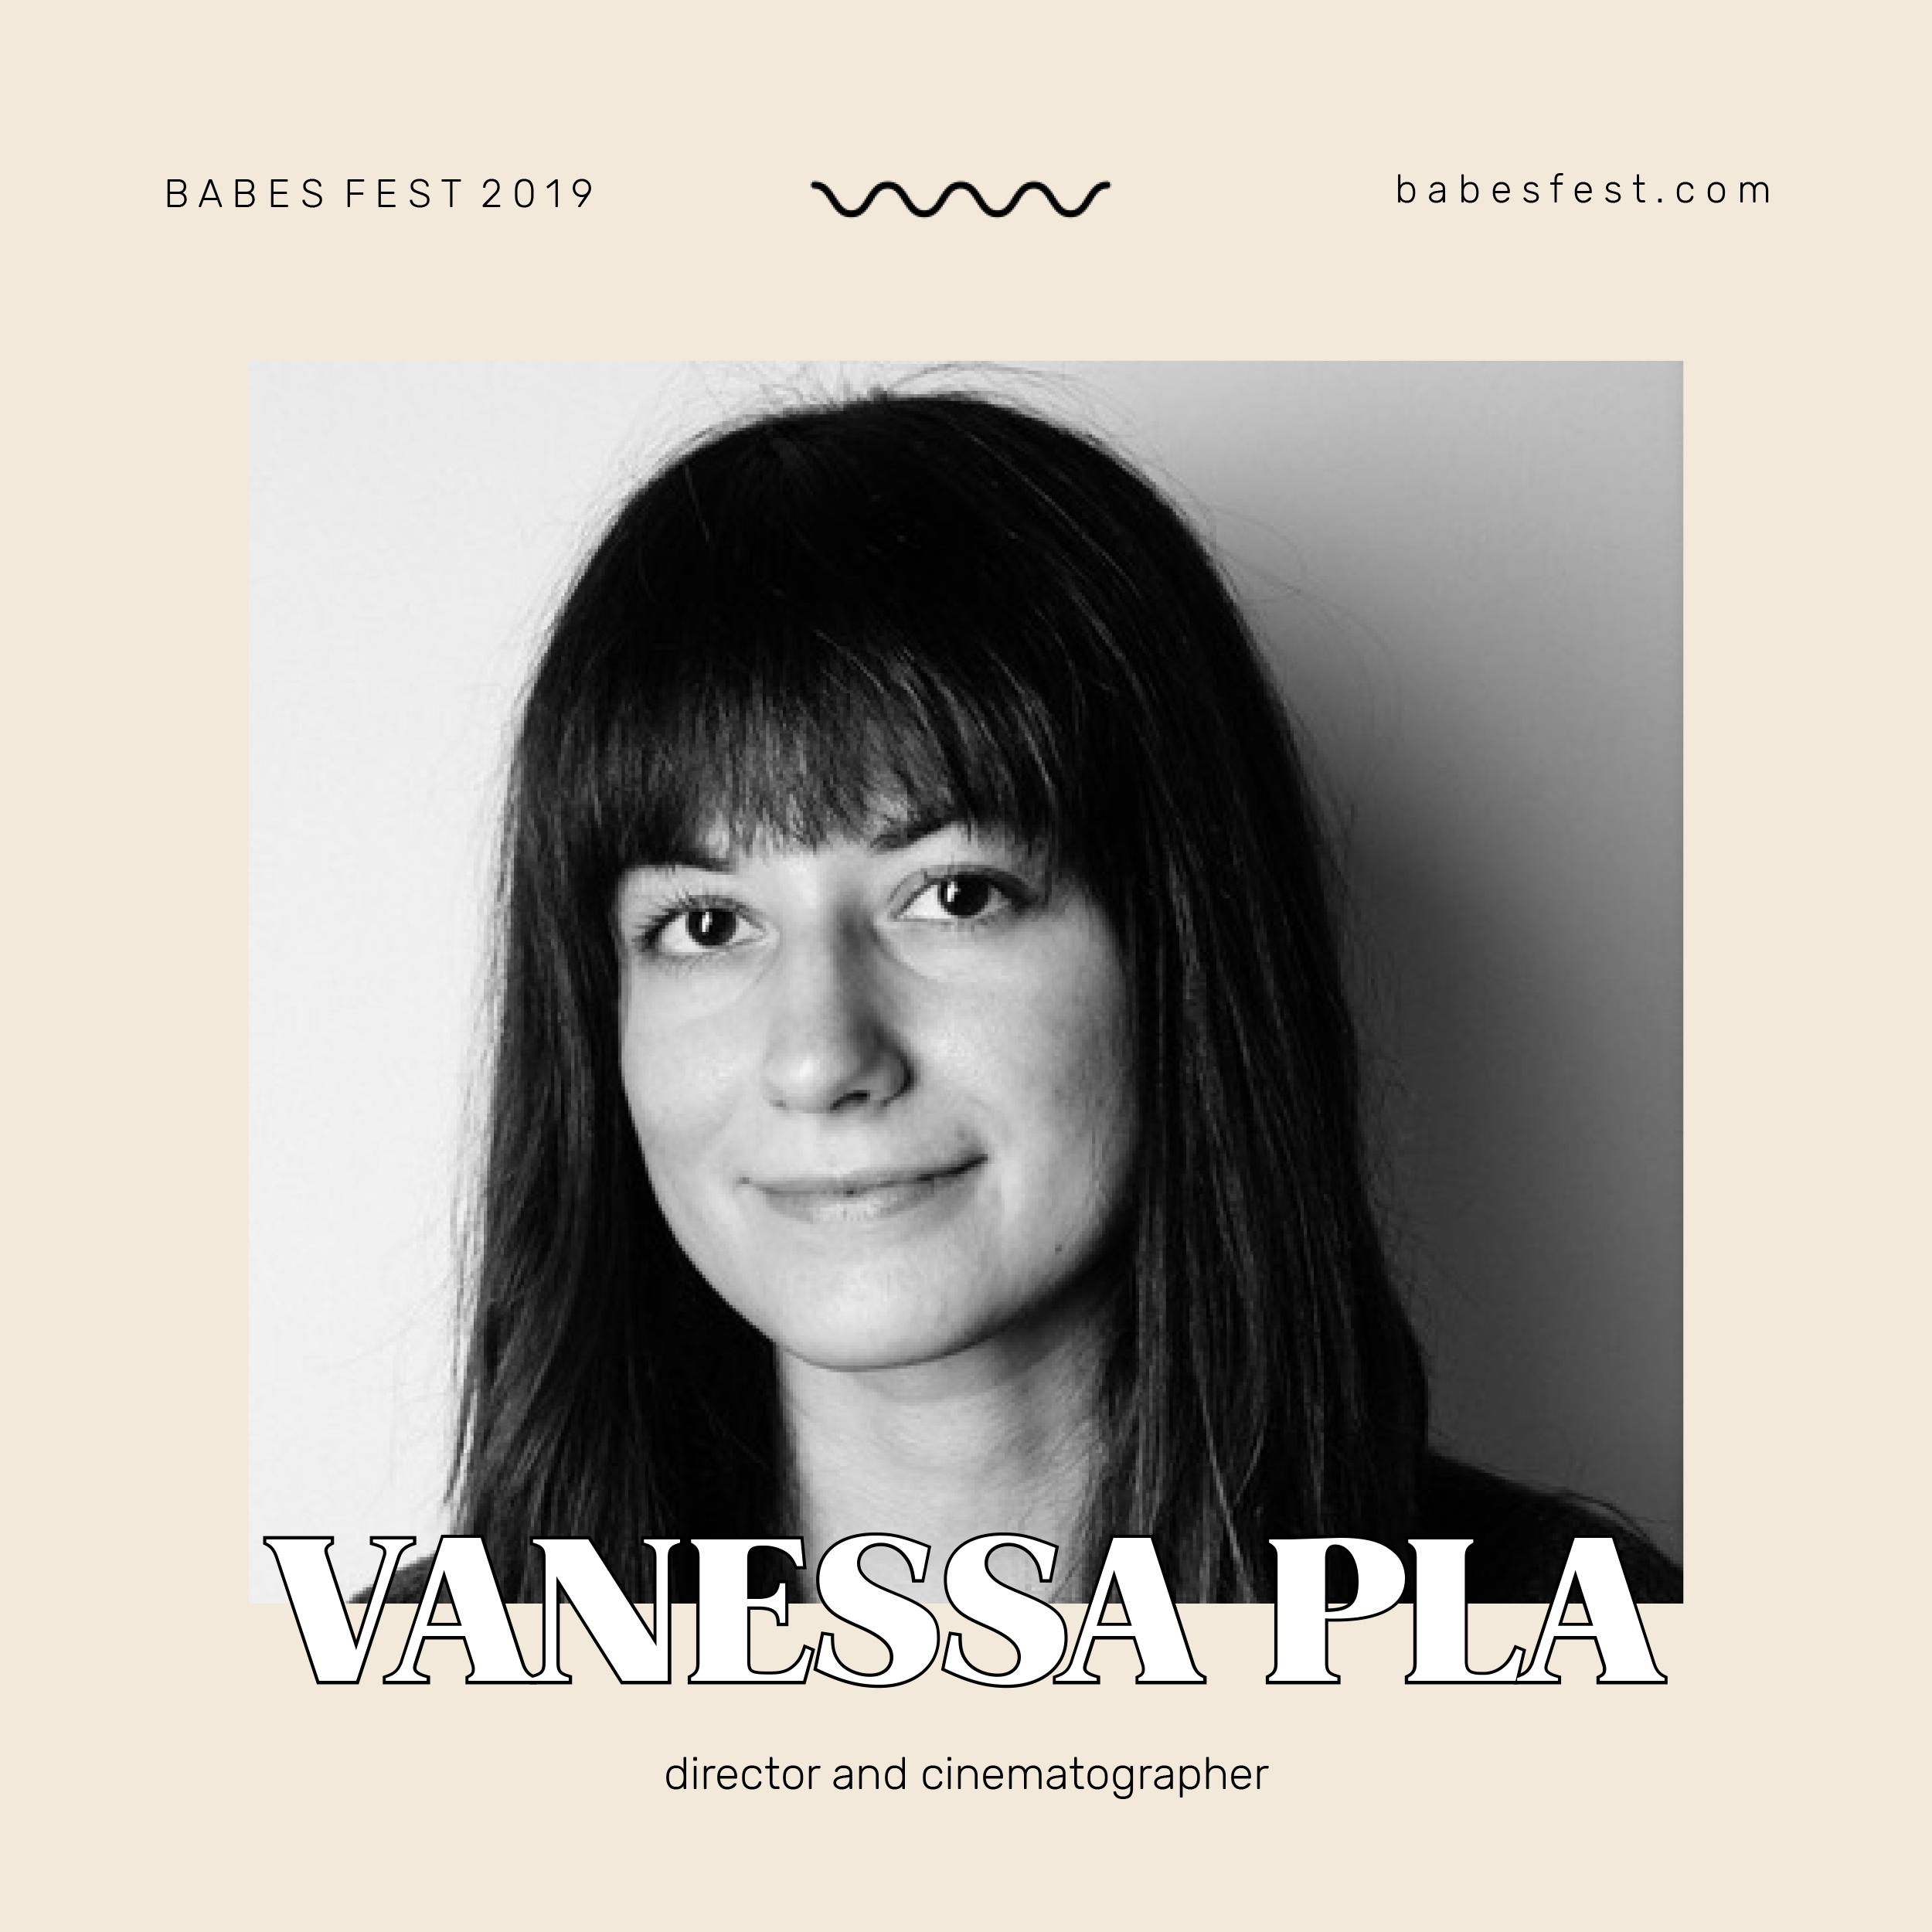 Vanessa Pla